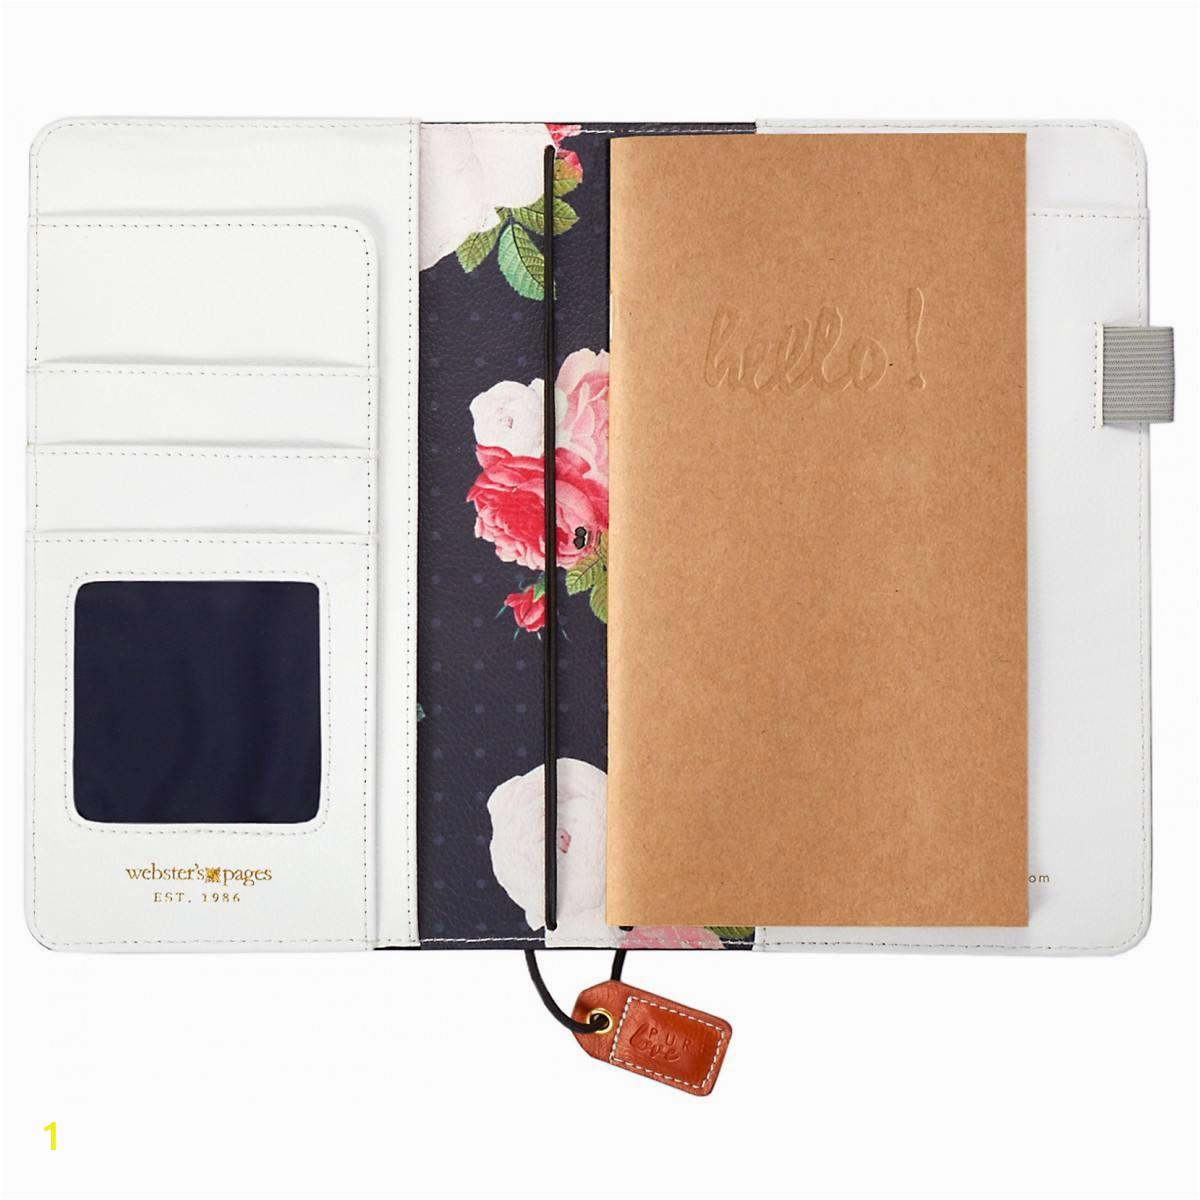 websters pages color crush travelers notebook planner black floral 2646